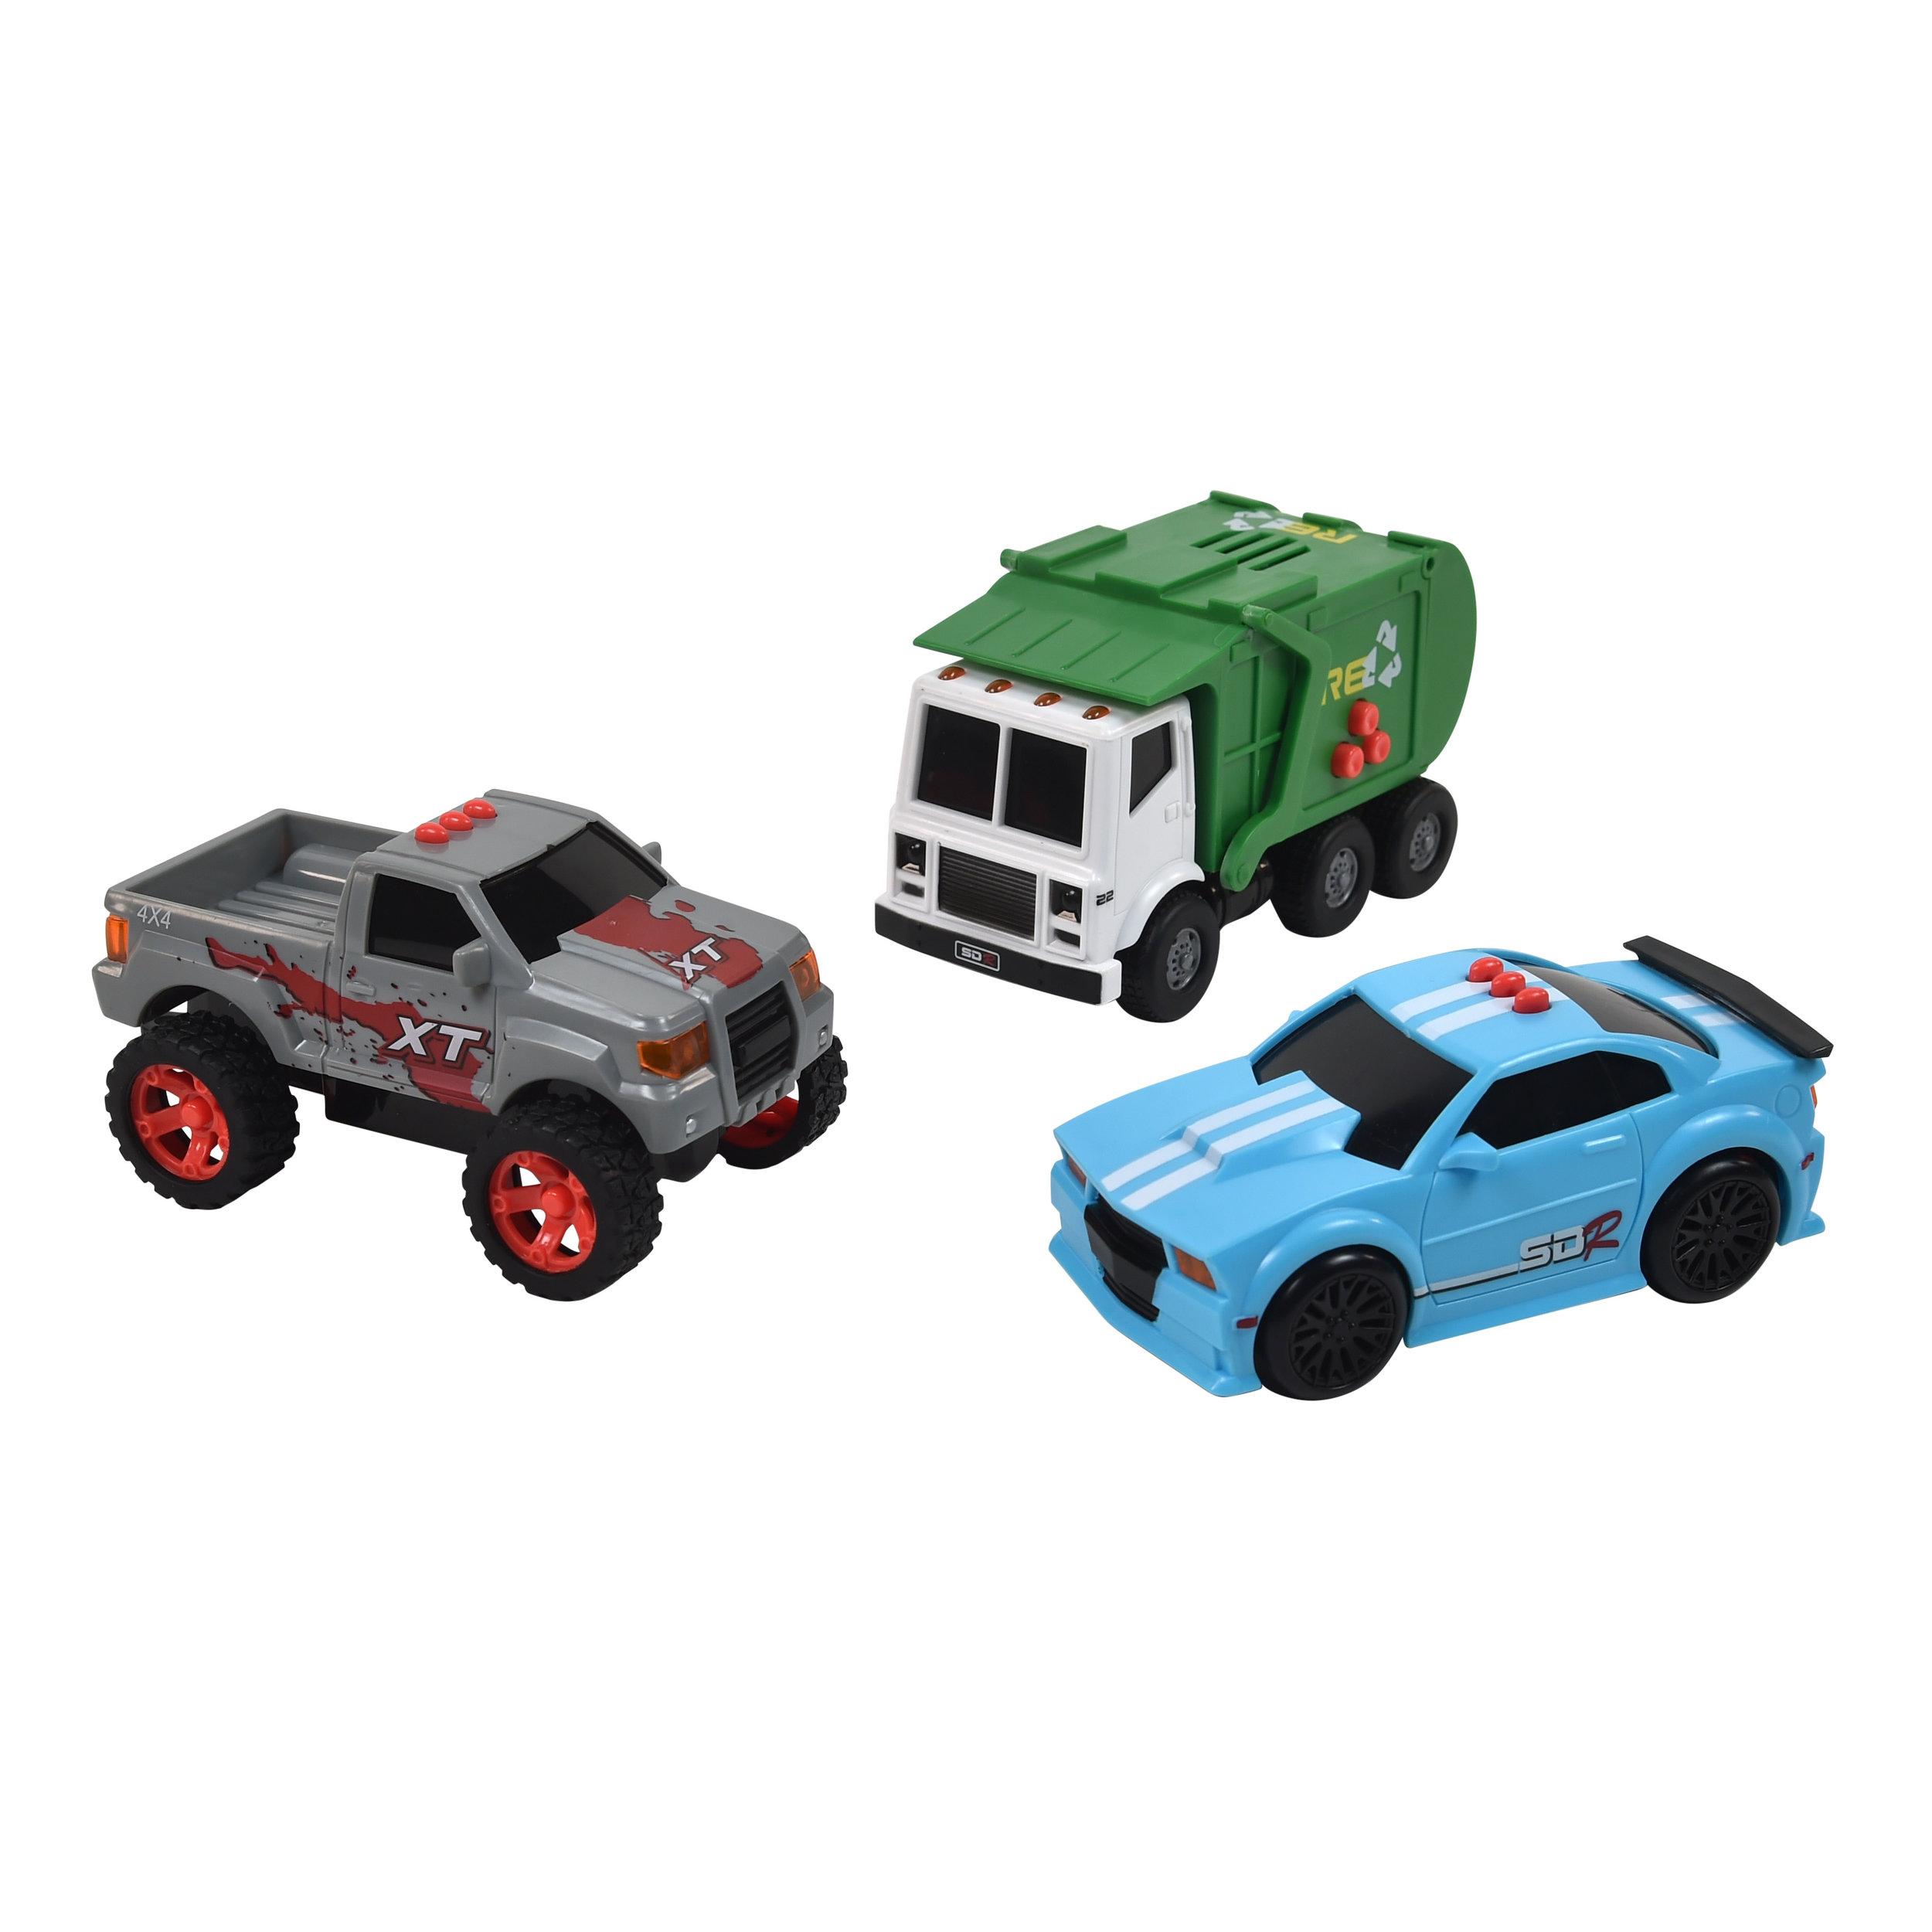 Mini City Series Vehicles 3-Pack